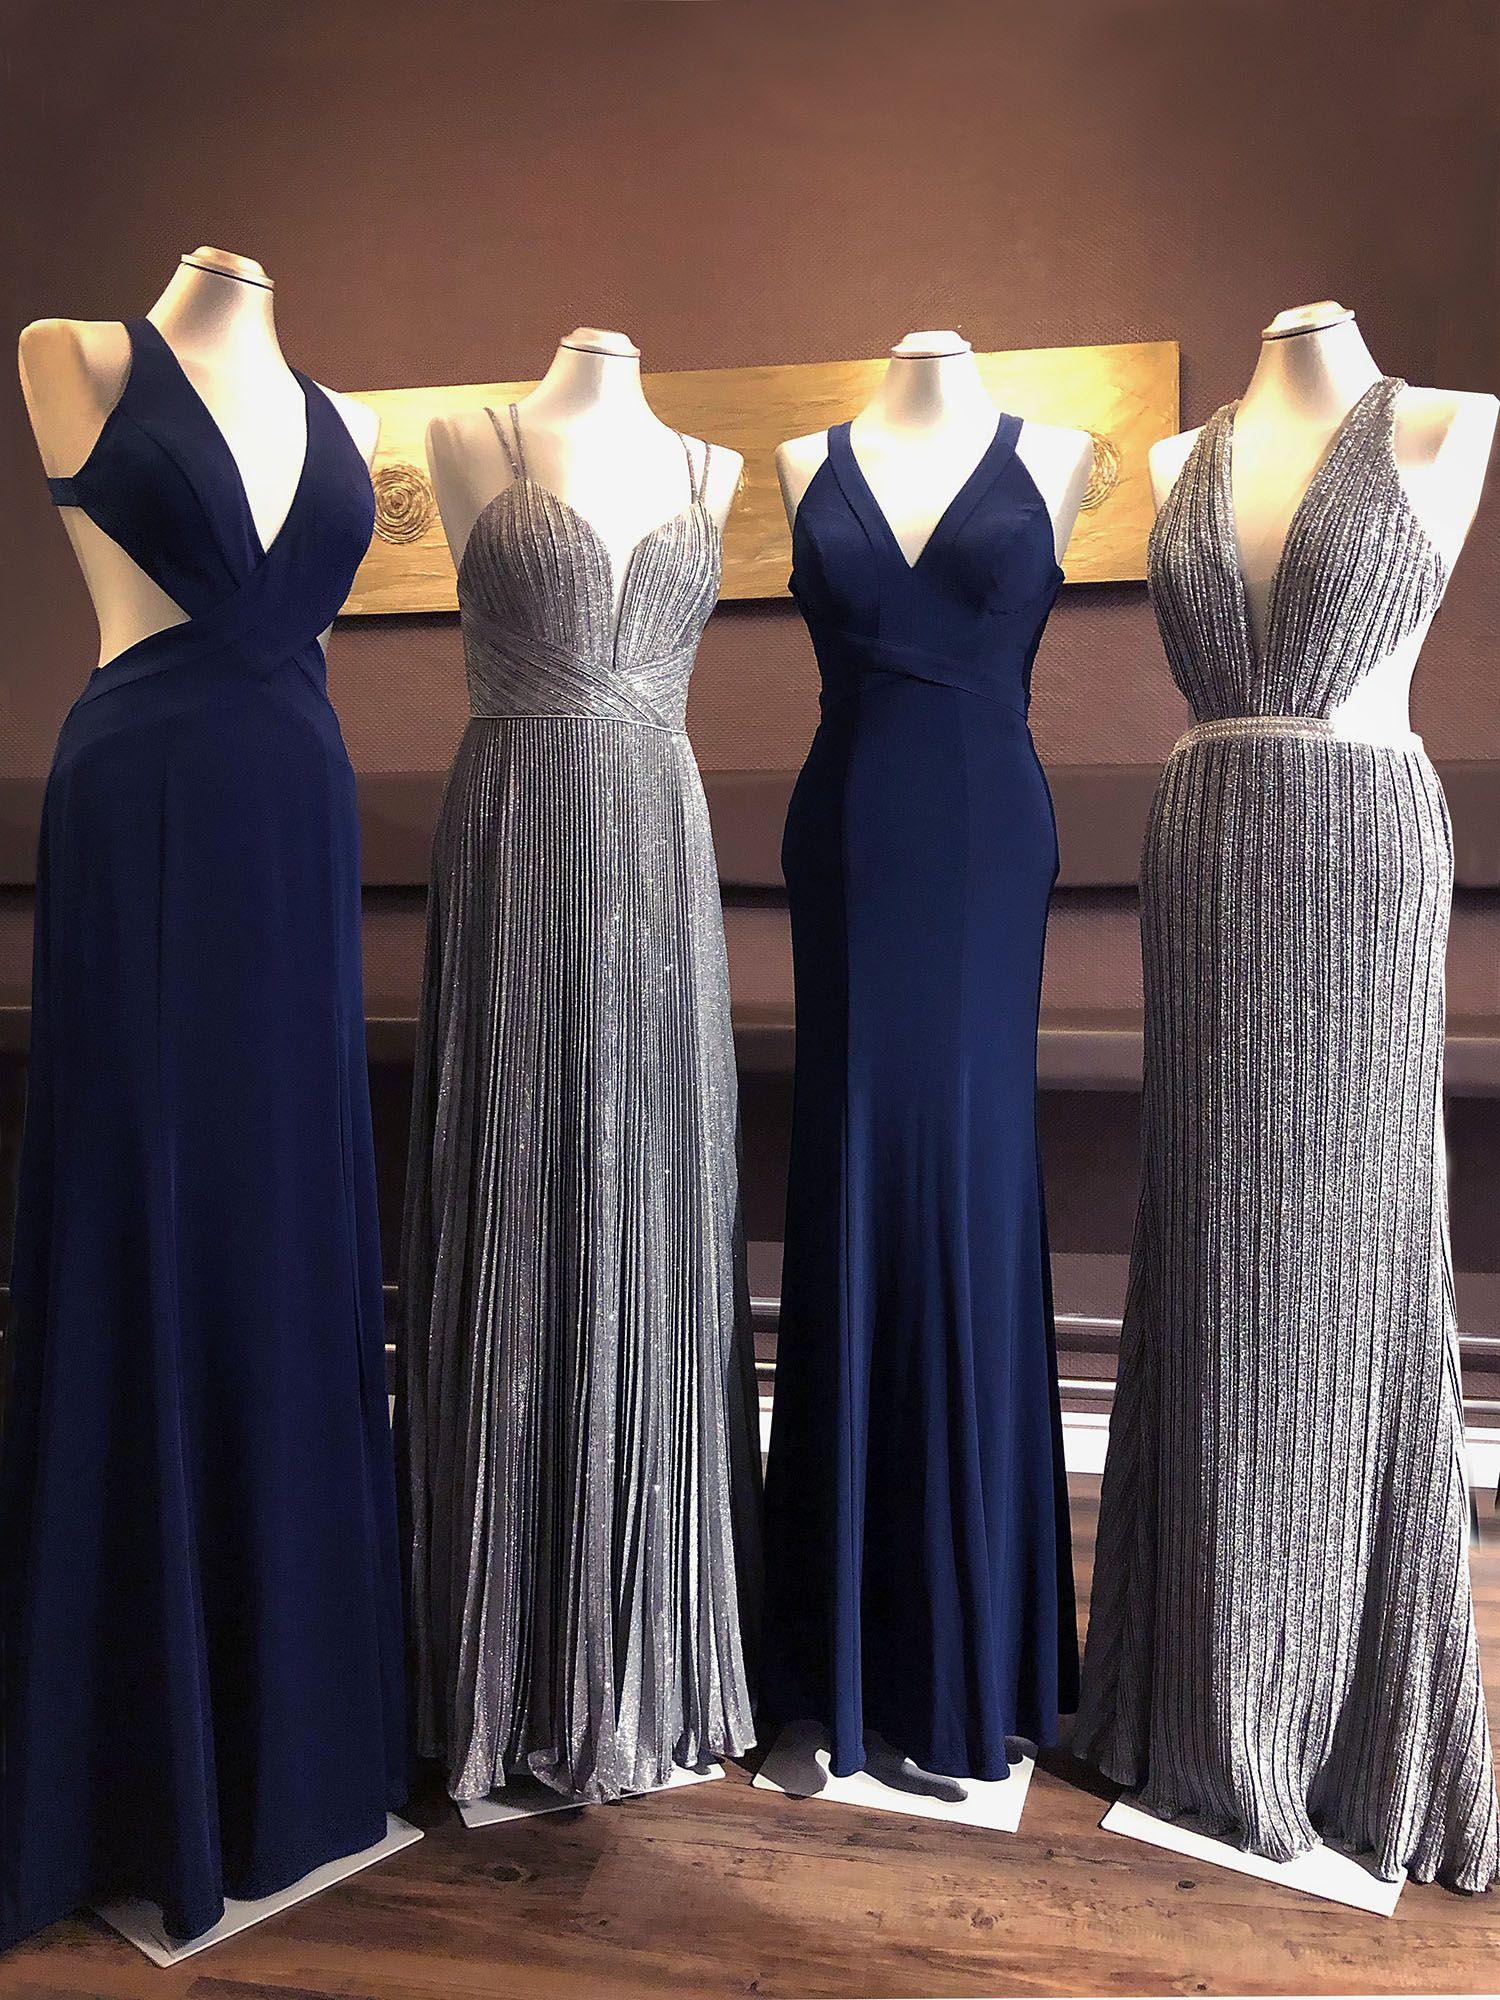 17 Großartig About You Abendkleid Blau Bester PreisFormal Schön About You Abendkleid Blau Vertrieb